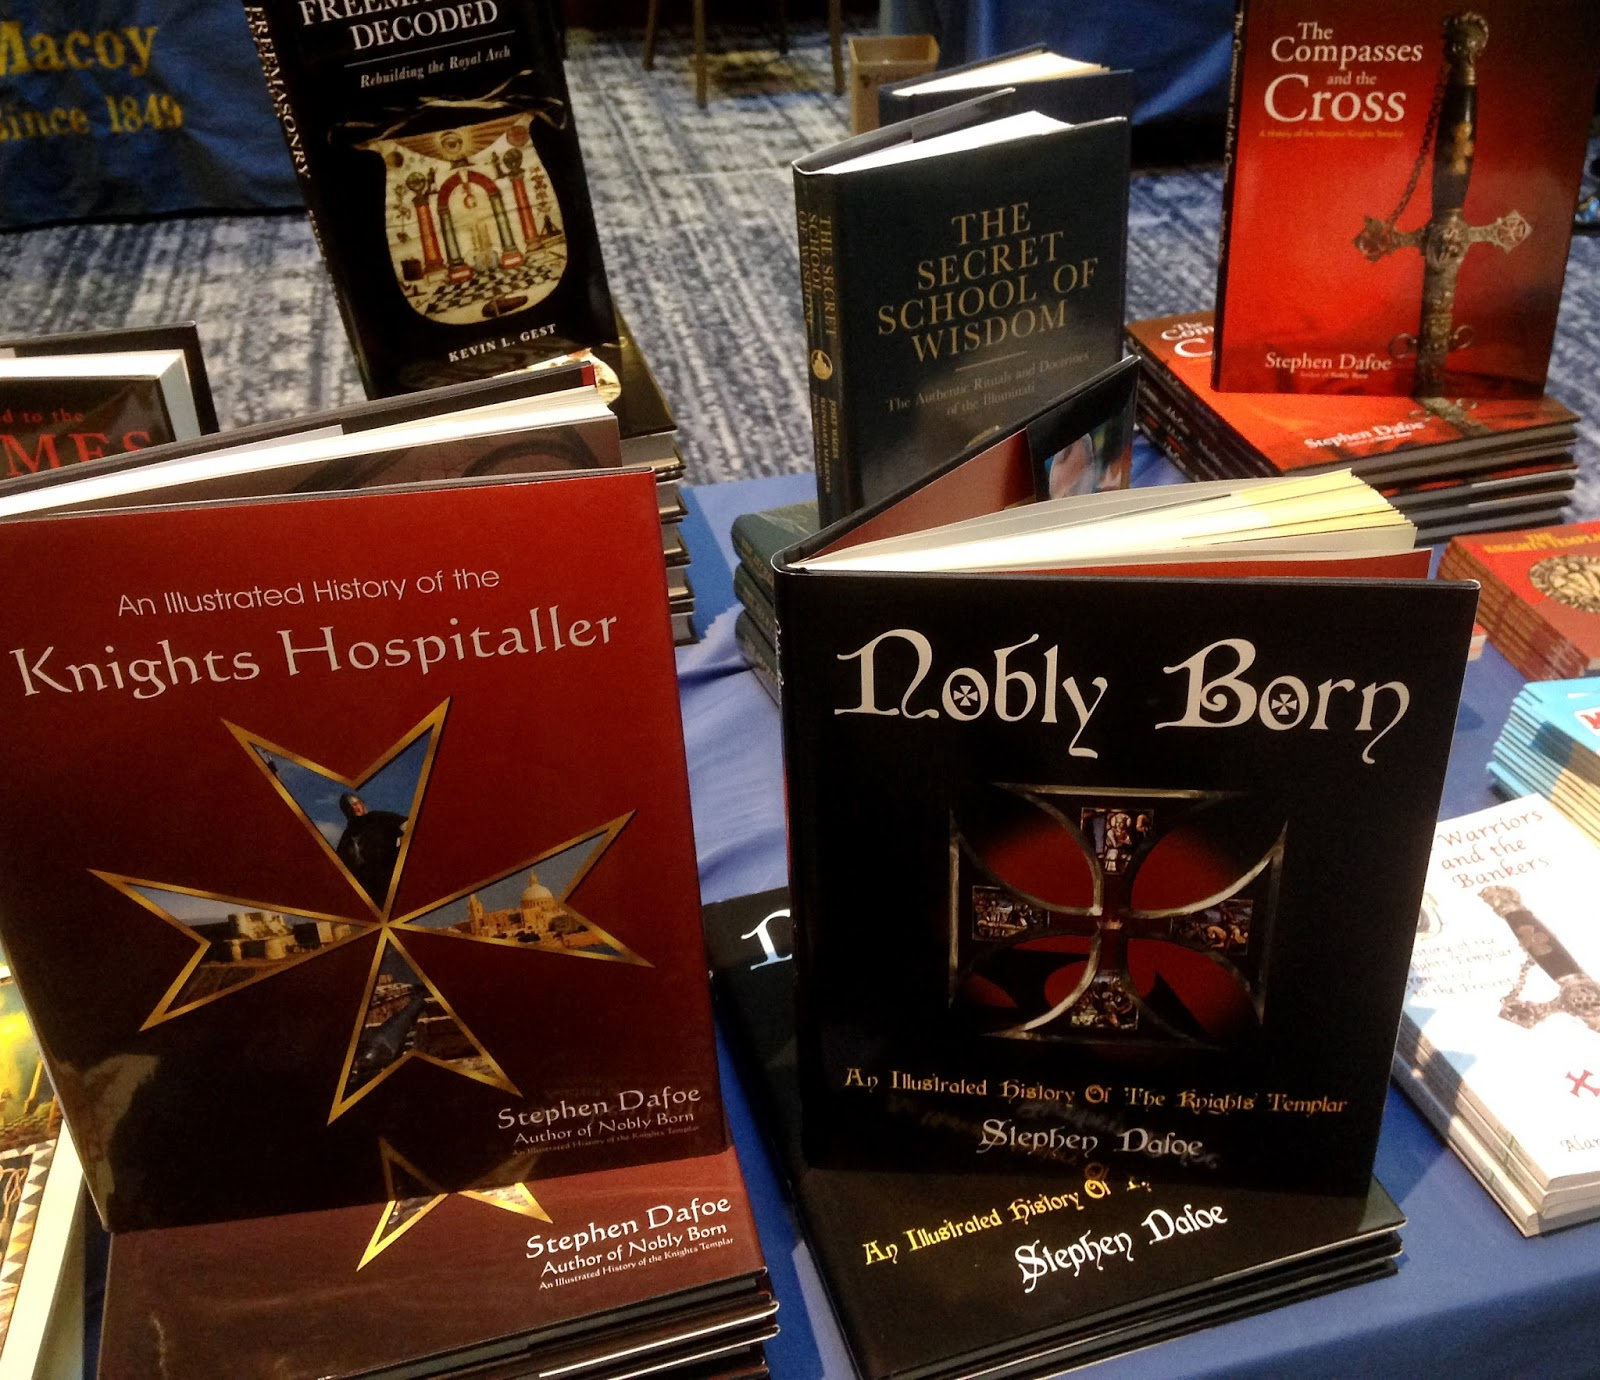 Occult Books FREEMASONRY Masonic Templar Knights Spiritual